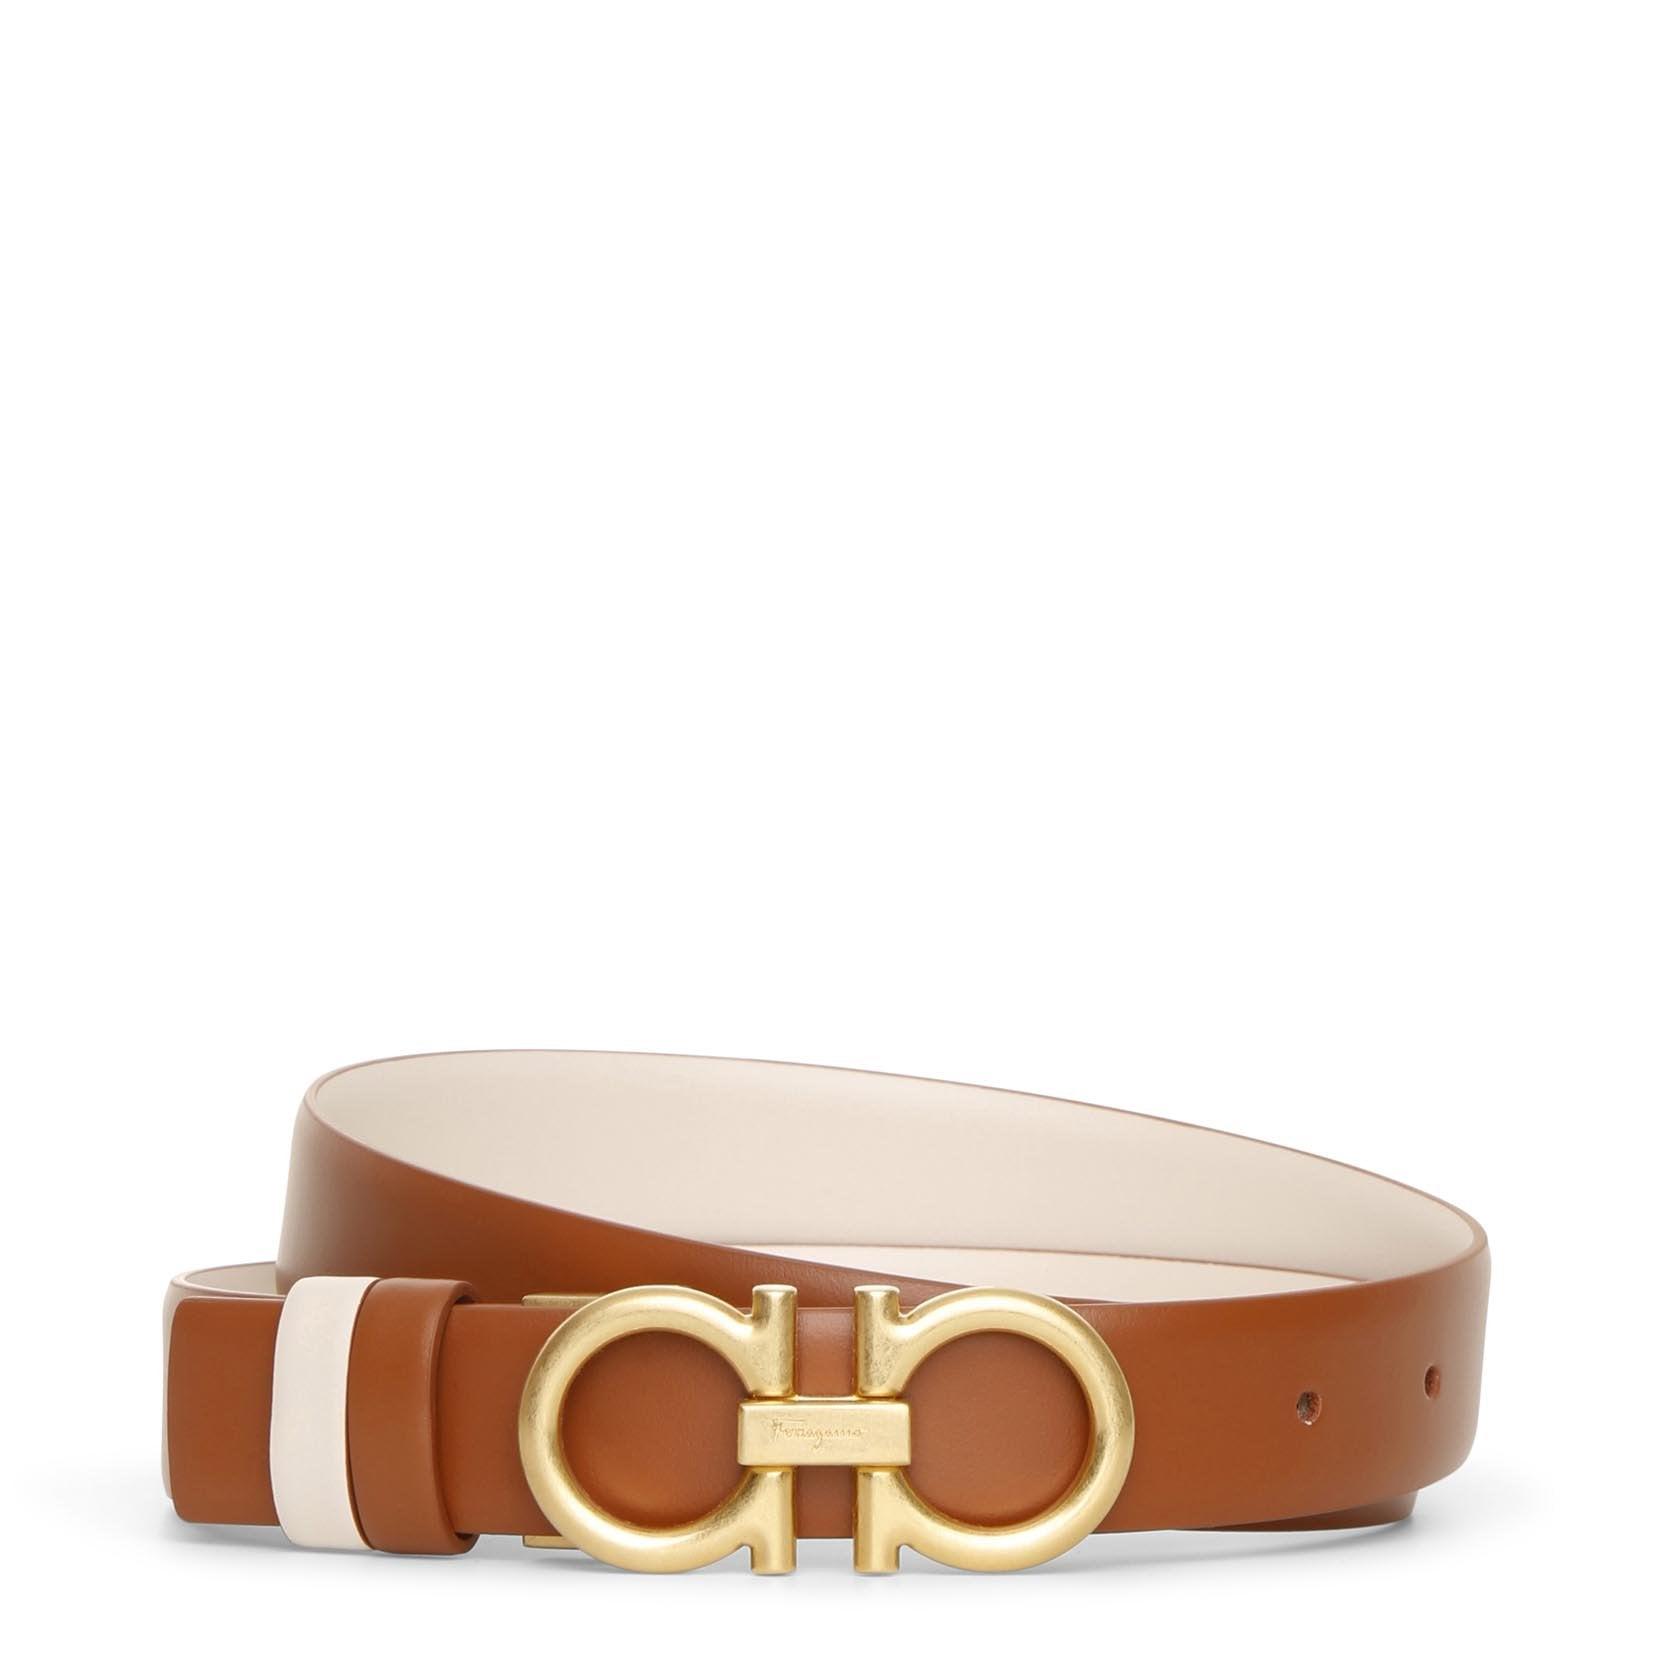 Salvatore Ferragamo Reversable and adjustable tan cream leather belt  - brown/beige - female - Size: 85